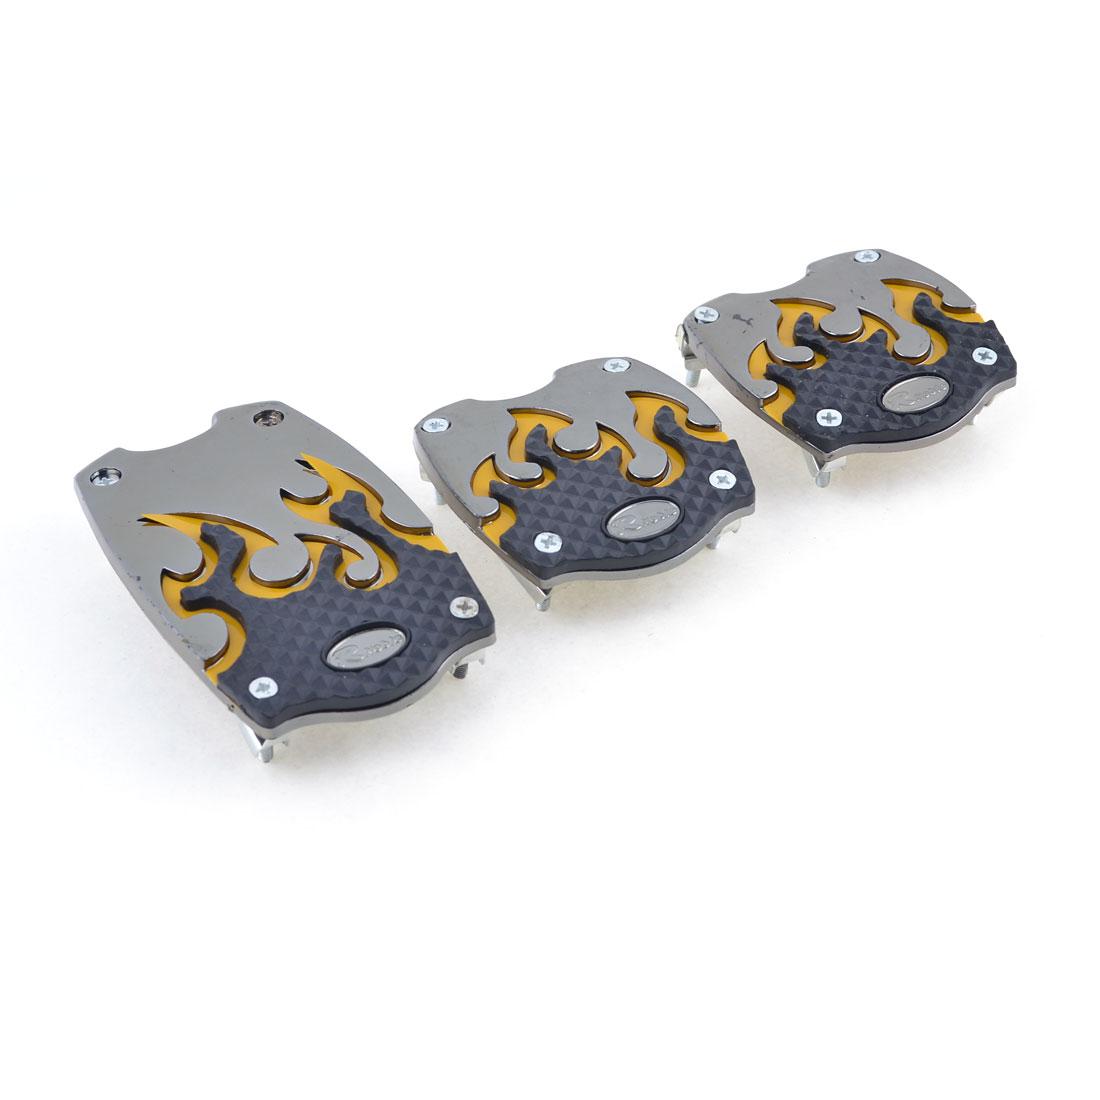 Multicolor Universal MT Car Nonslip Aluminum Gas Brake Clutch Pedal Cover Set